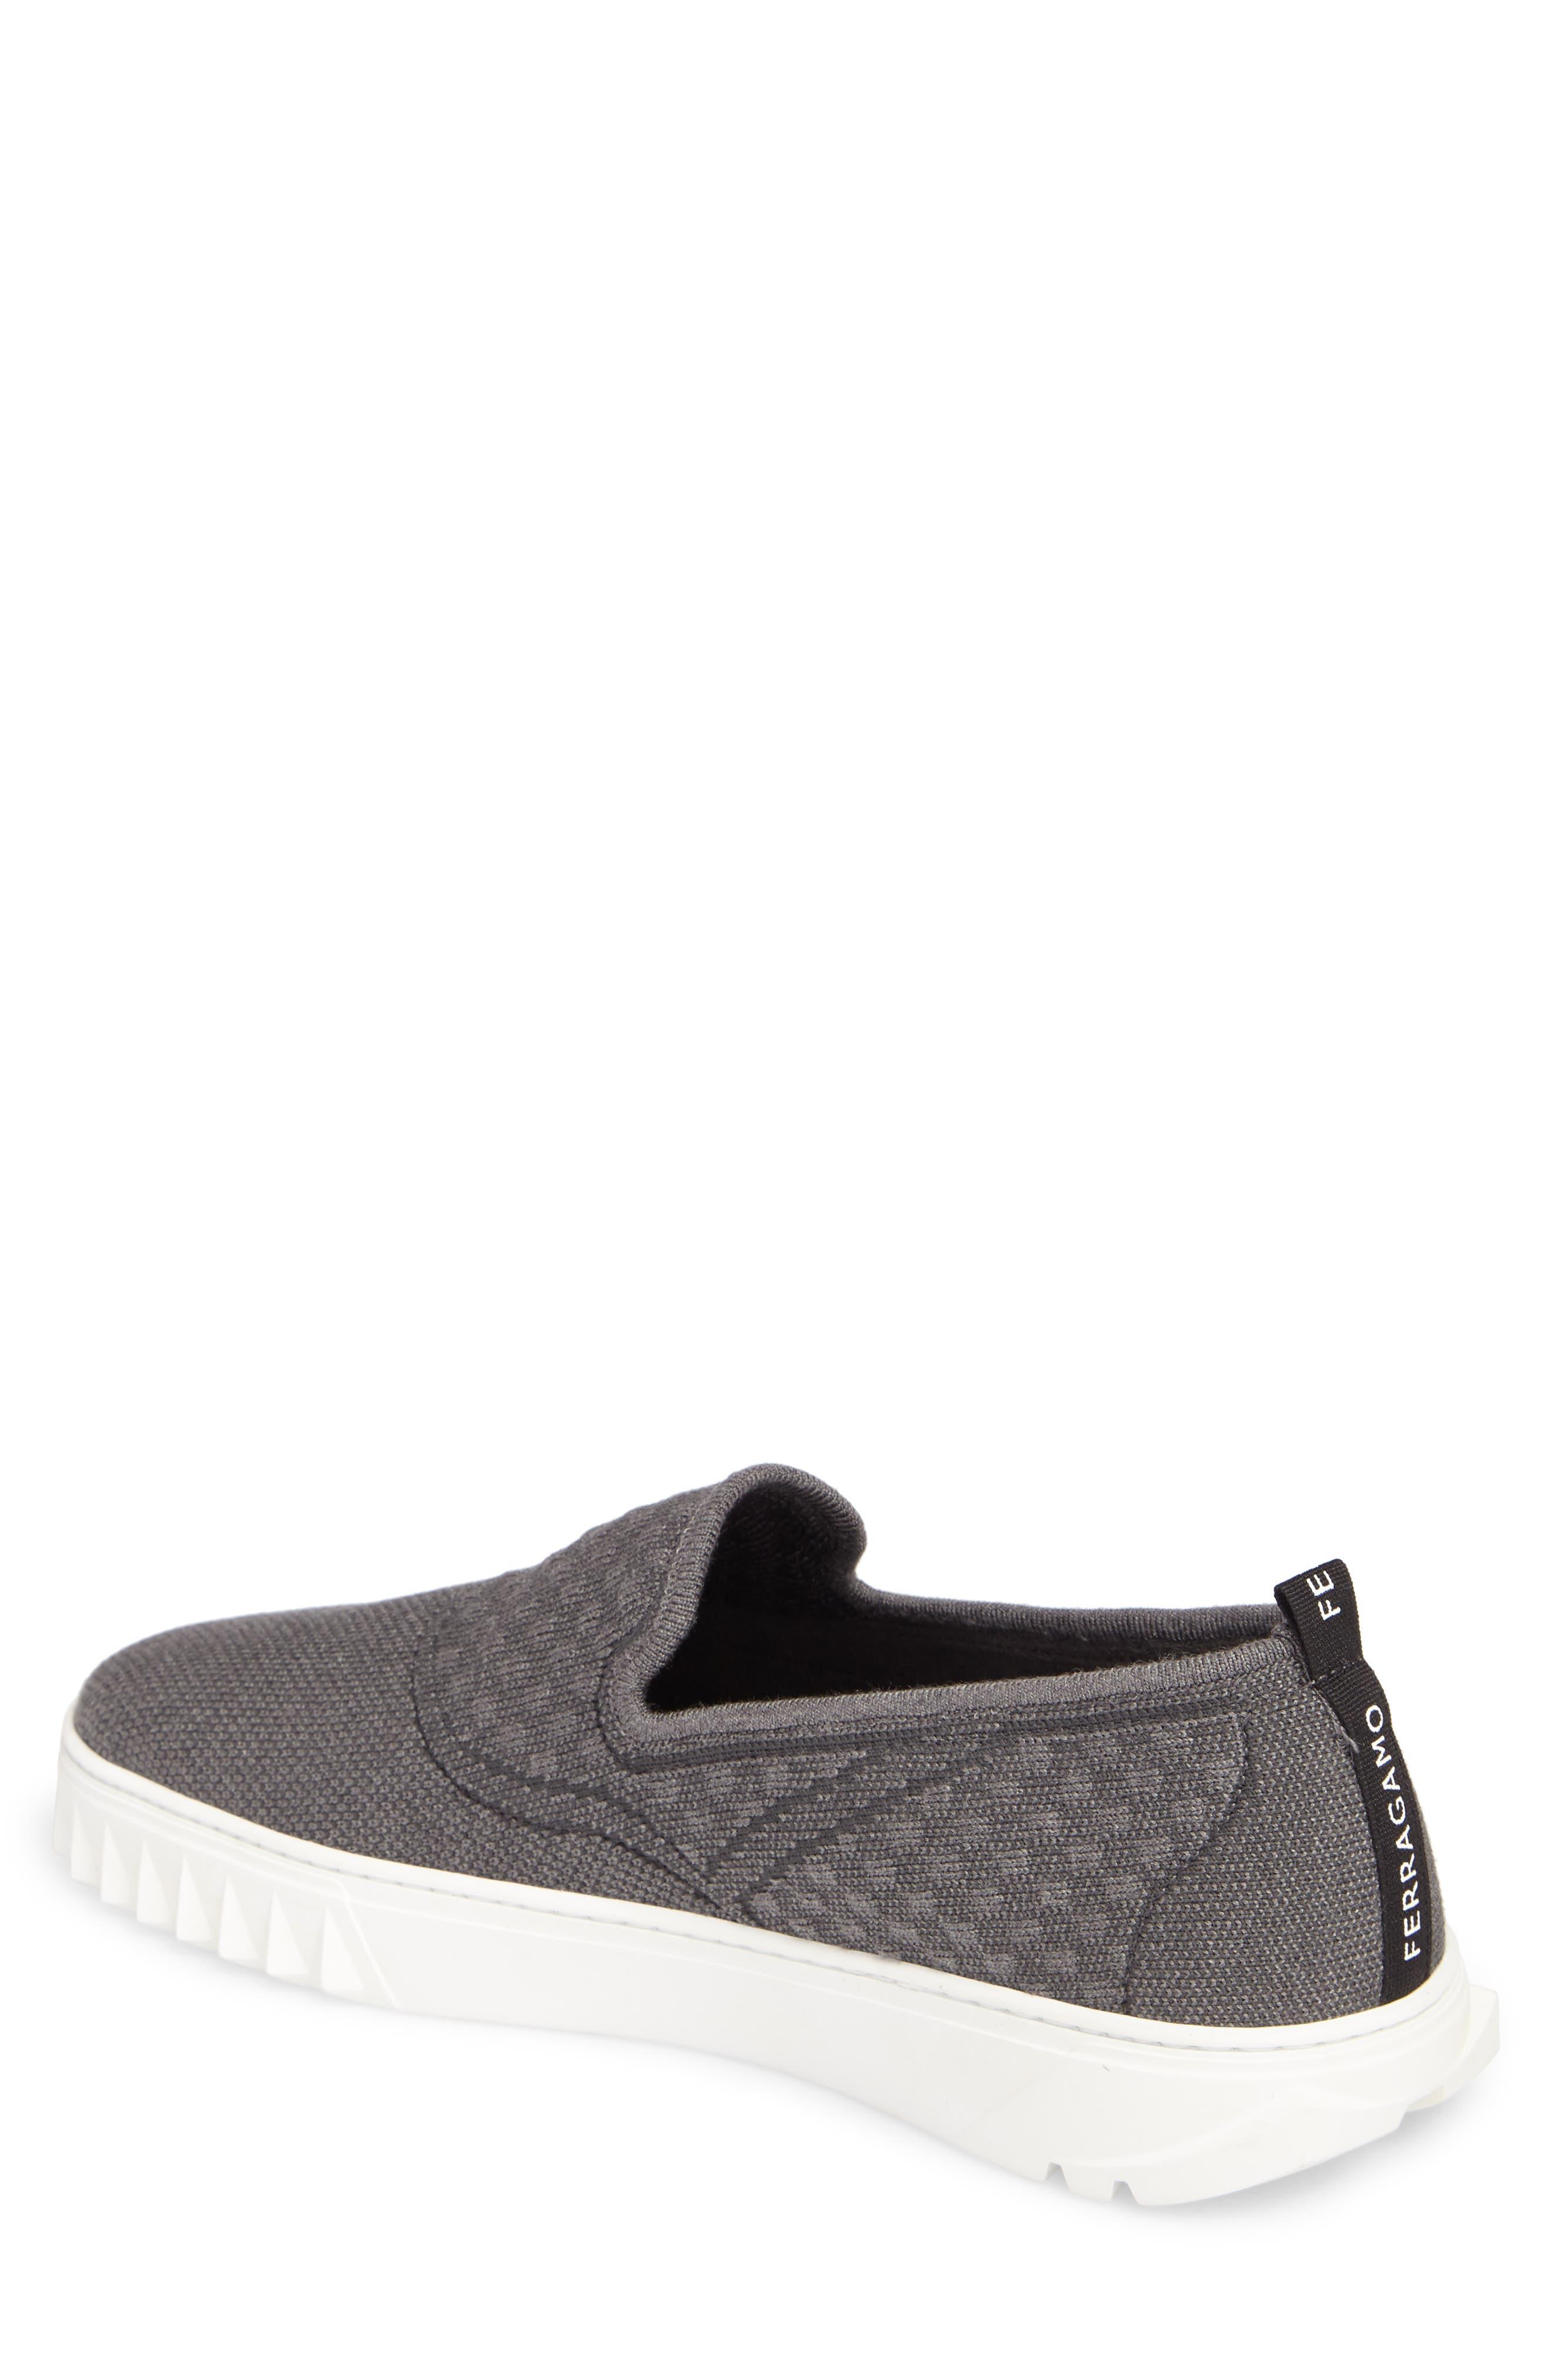 Clay Slip-On Sneaker,                             Alternate thumbnail 2, color,                             022